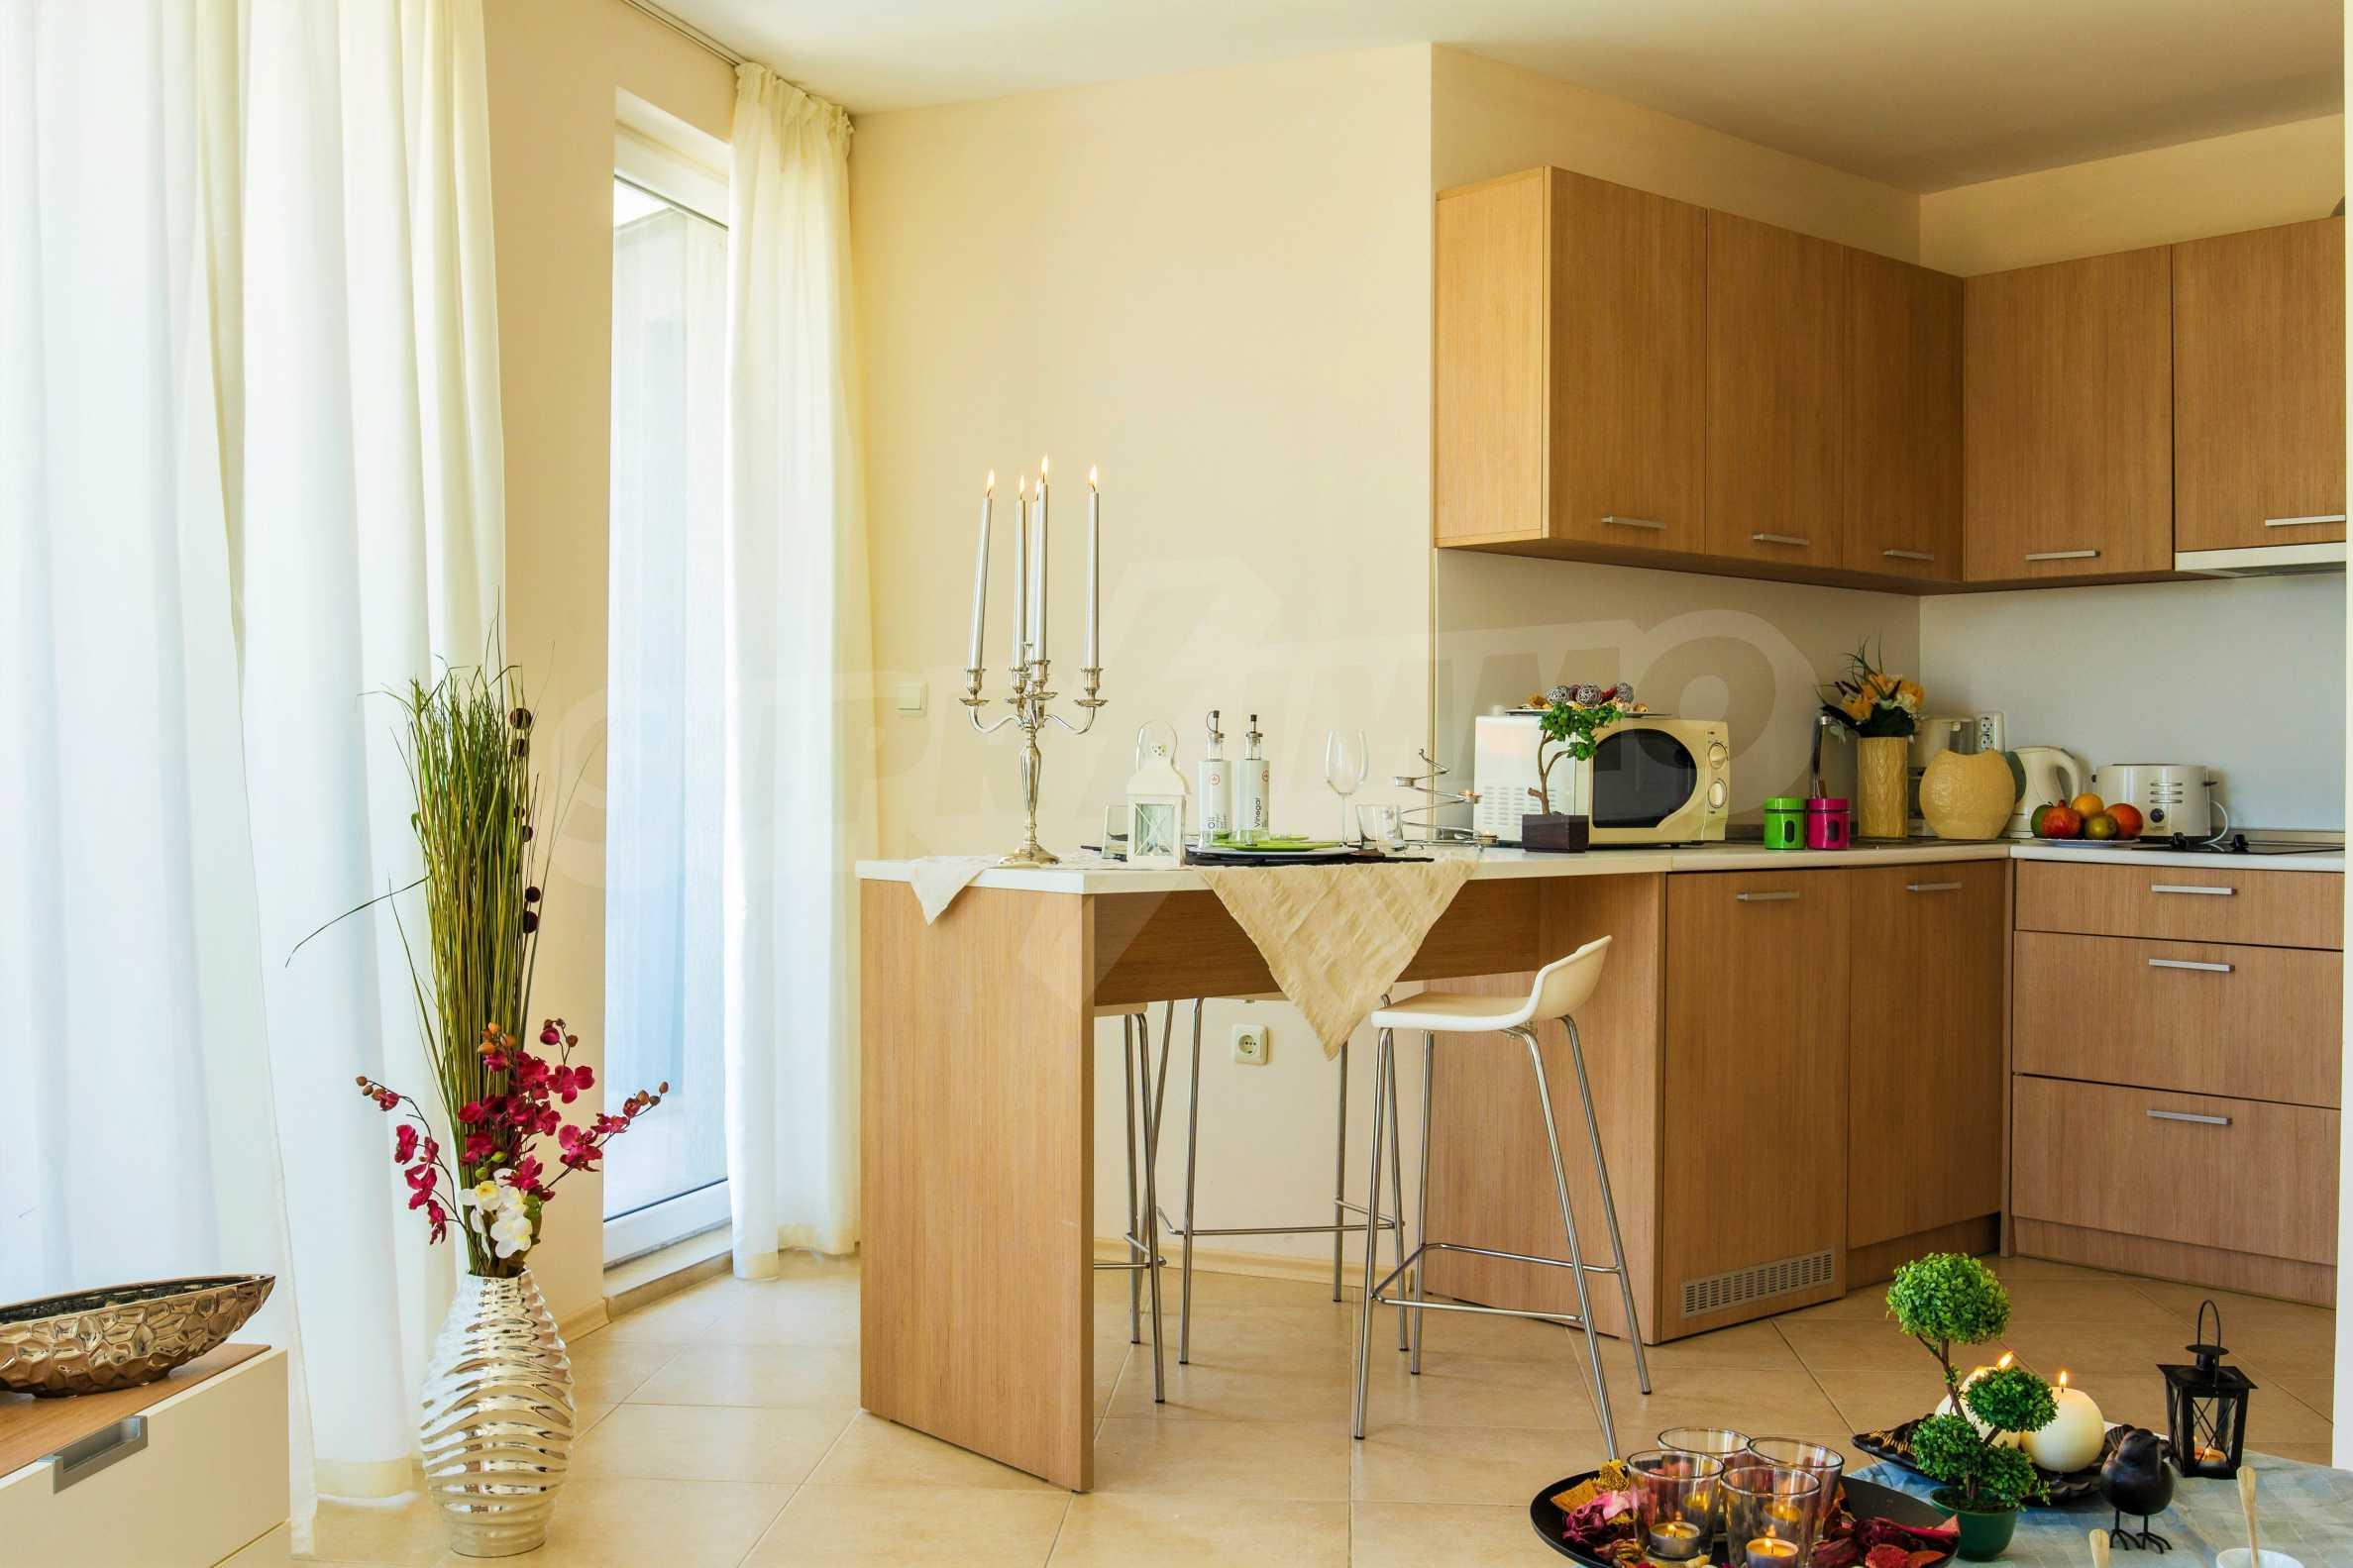 Тристаен апартамент в комплекс Емберли близо до плажа в Лозенец (ап. №423) 4